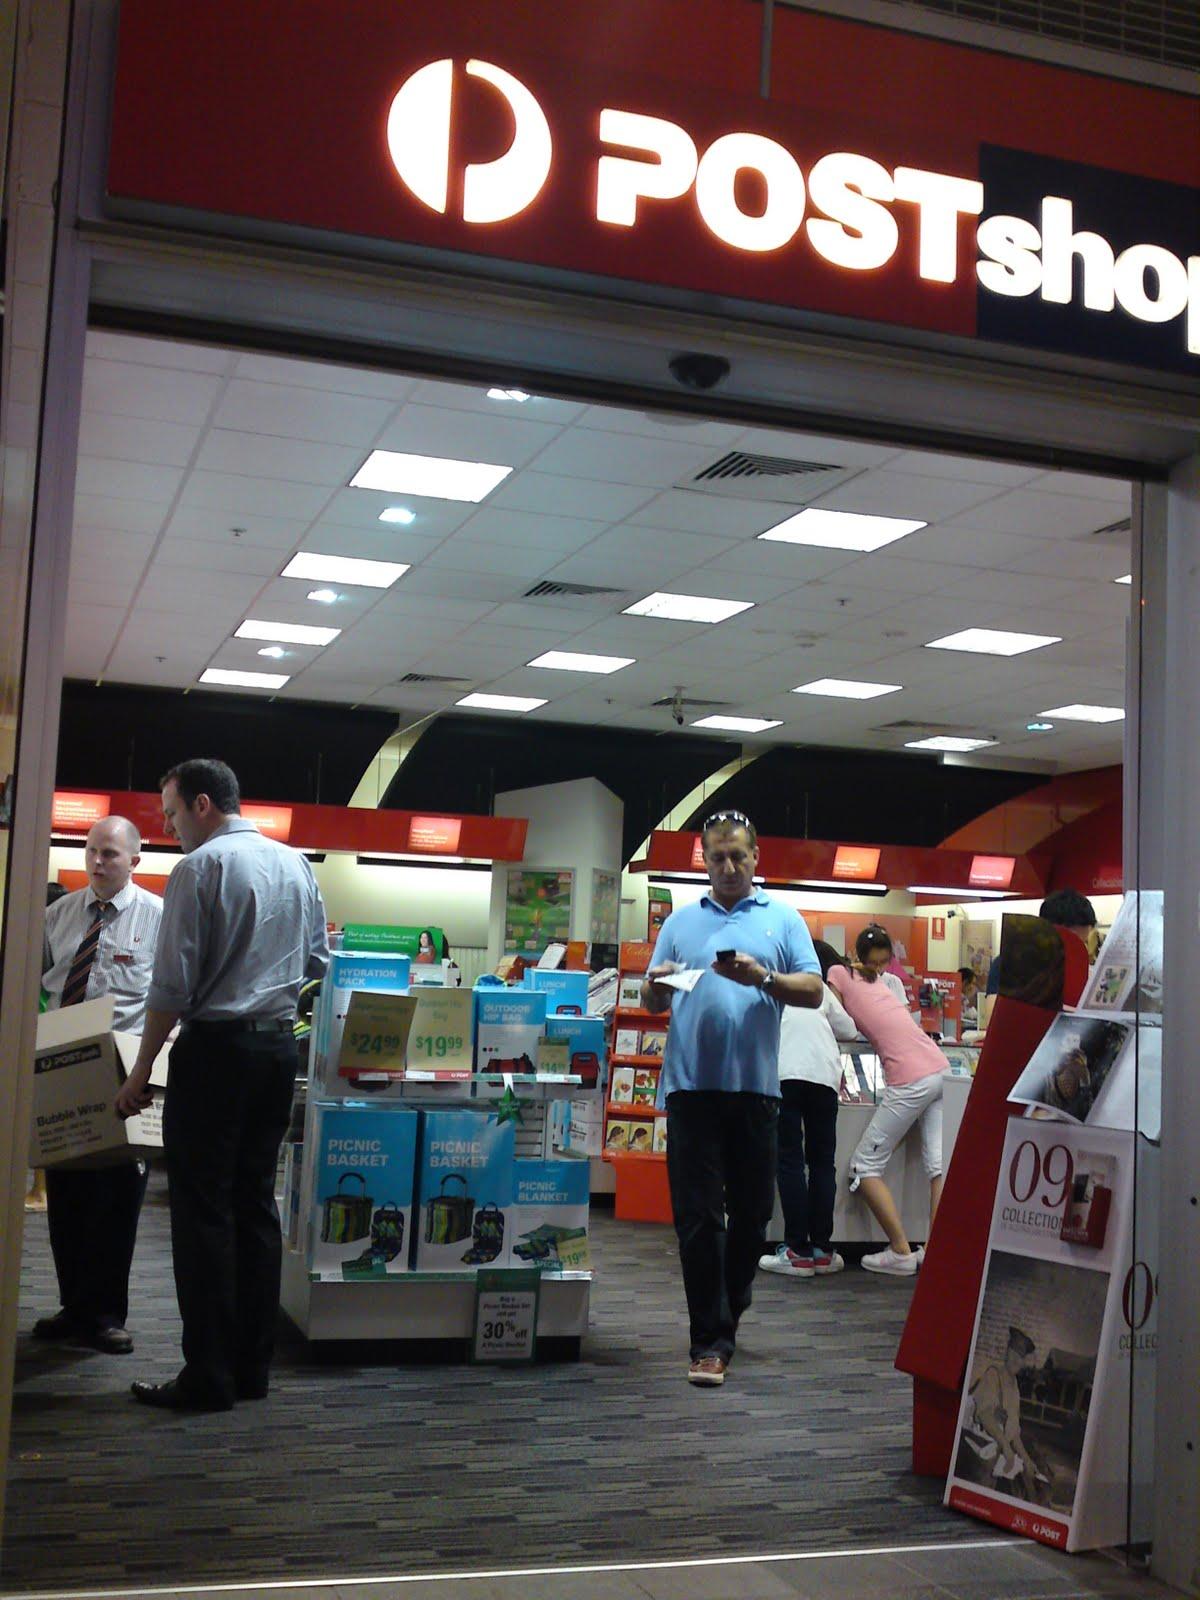 The SHOPPOLOGIST: Post Shop sales no picnic